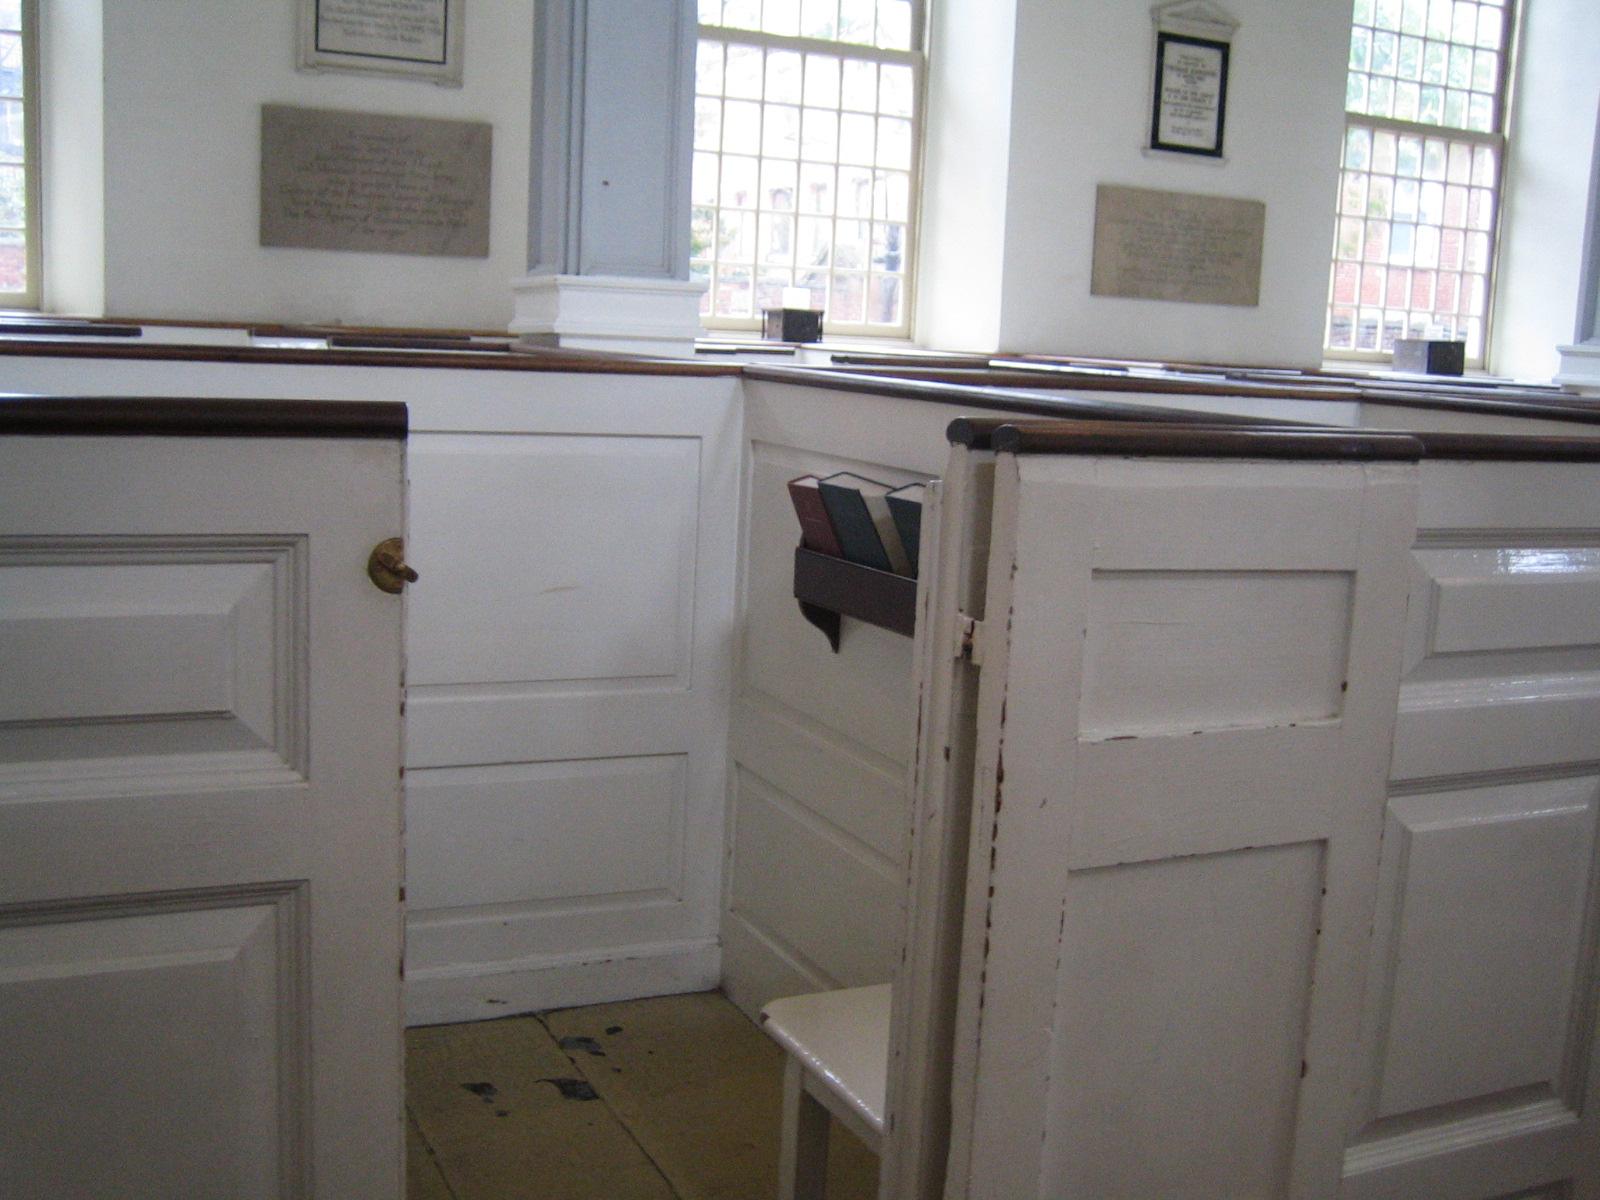 Boston - Pew Box in Old North Church